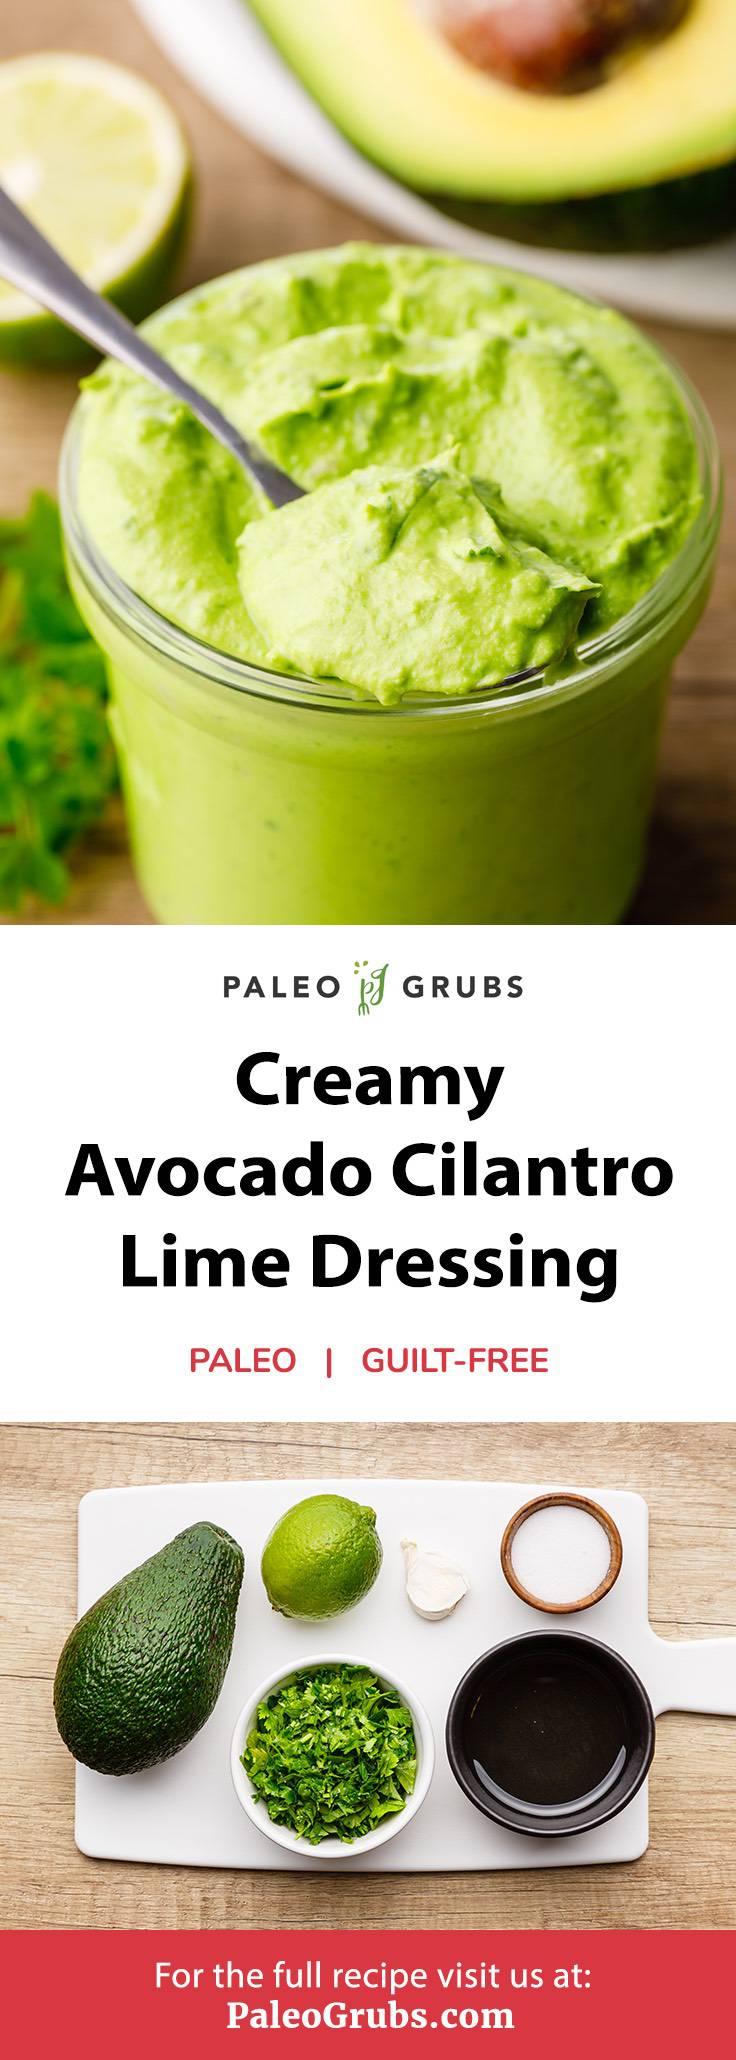 Home.fit cilantro-lime-dairy-free-avocado-dressing Creamy Avocado Cilantro Lime Dressing (Dairy-Free)